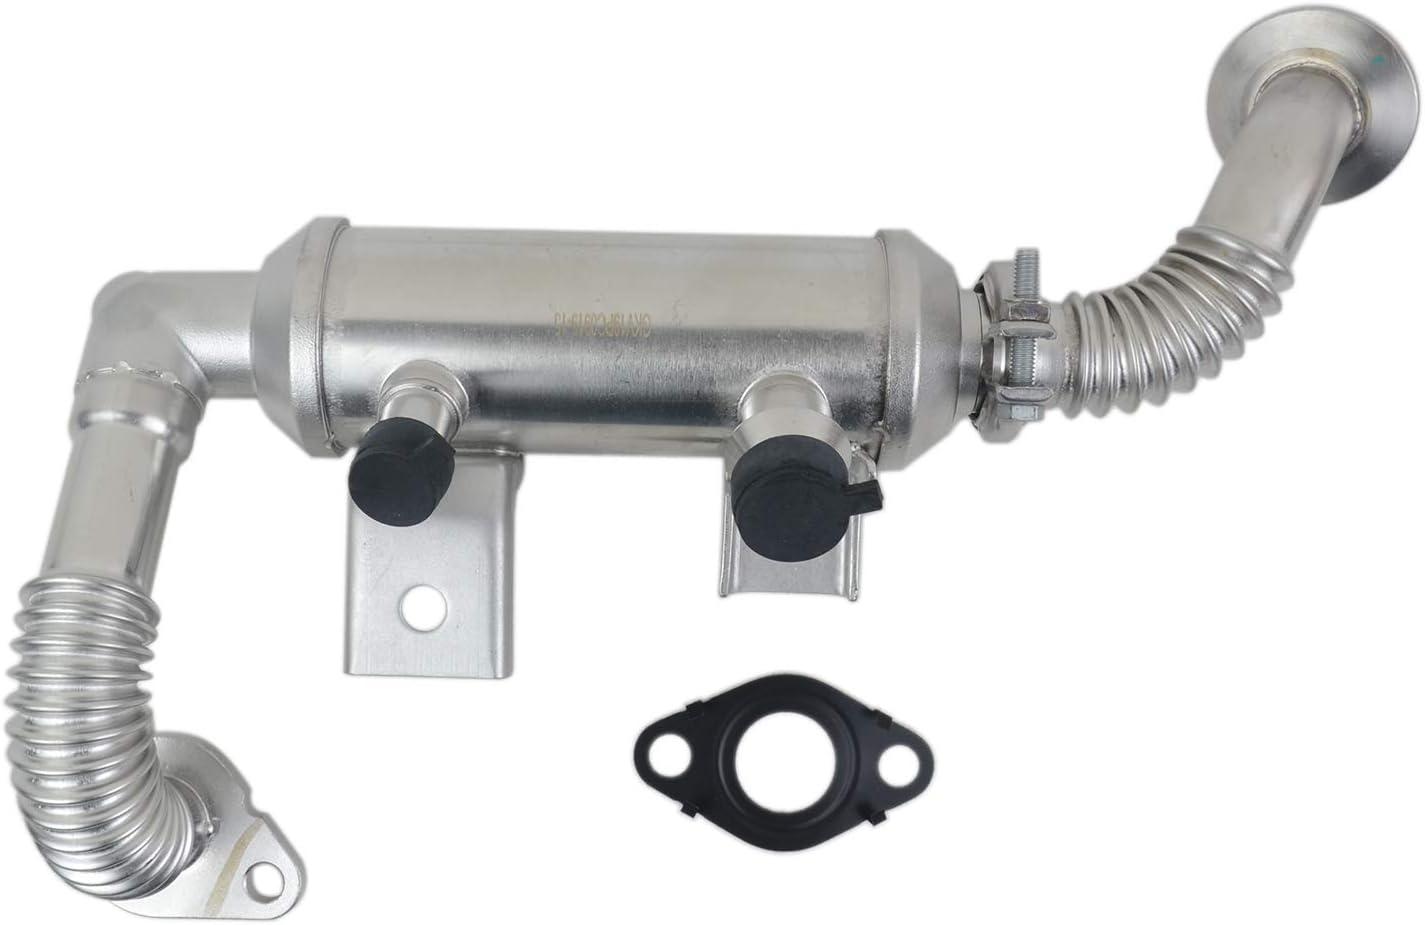 SCSN EGR 1700025 1430567 V/álvula de refrigerador EGR